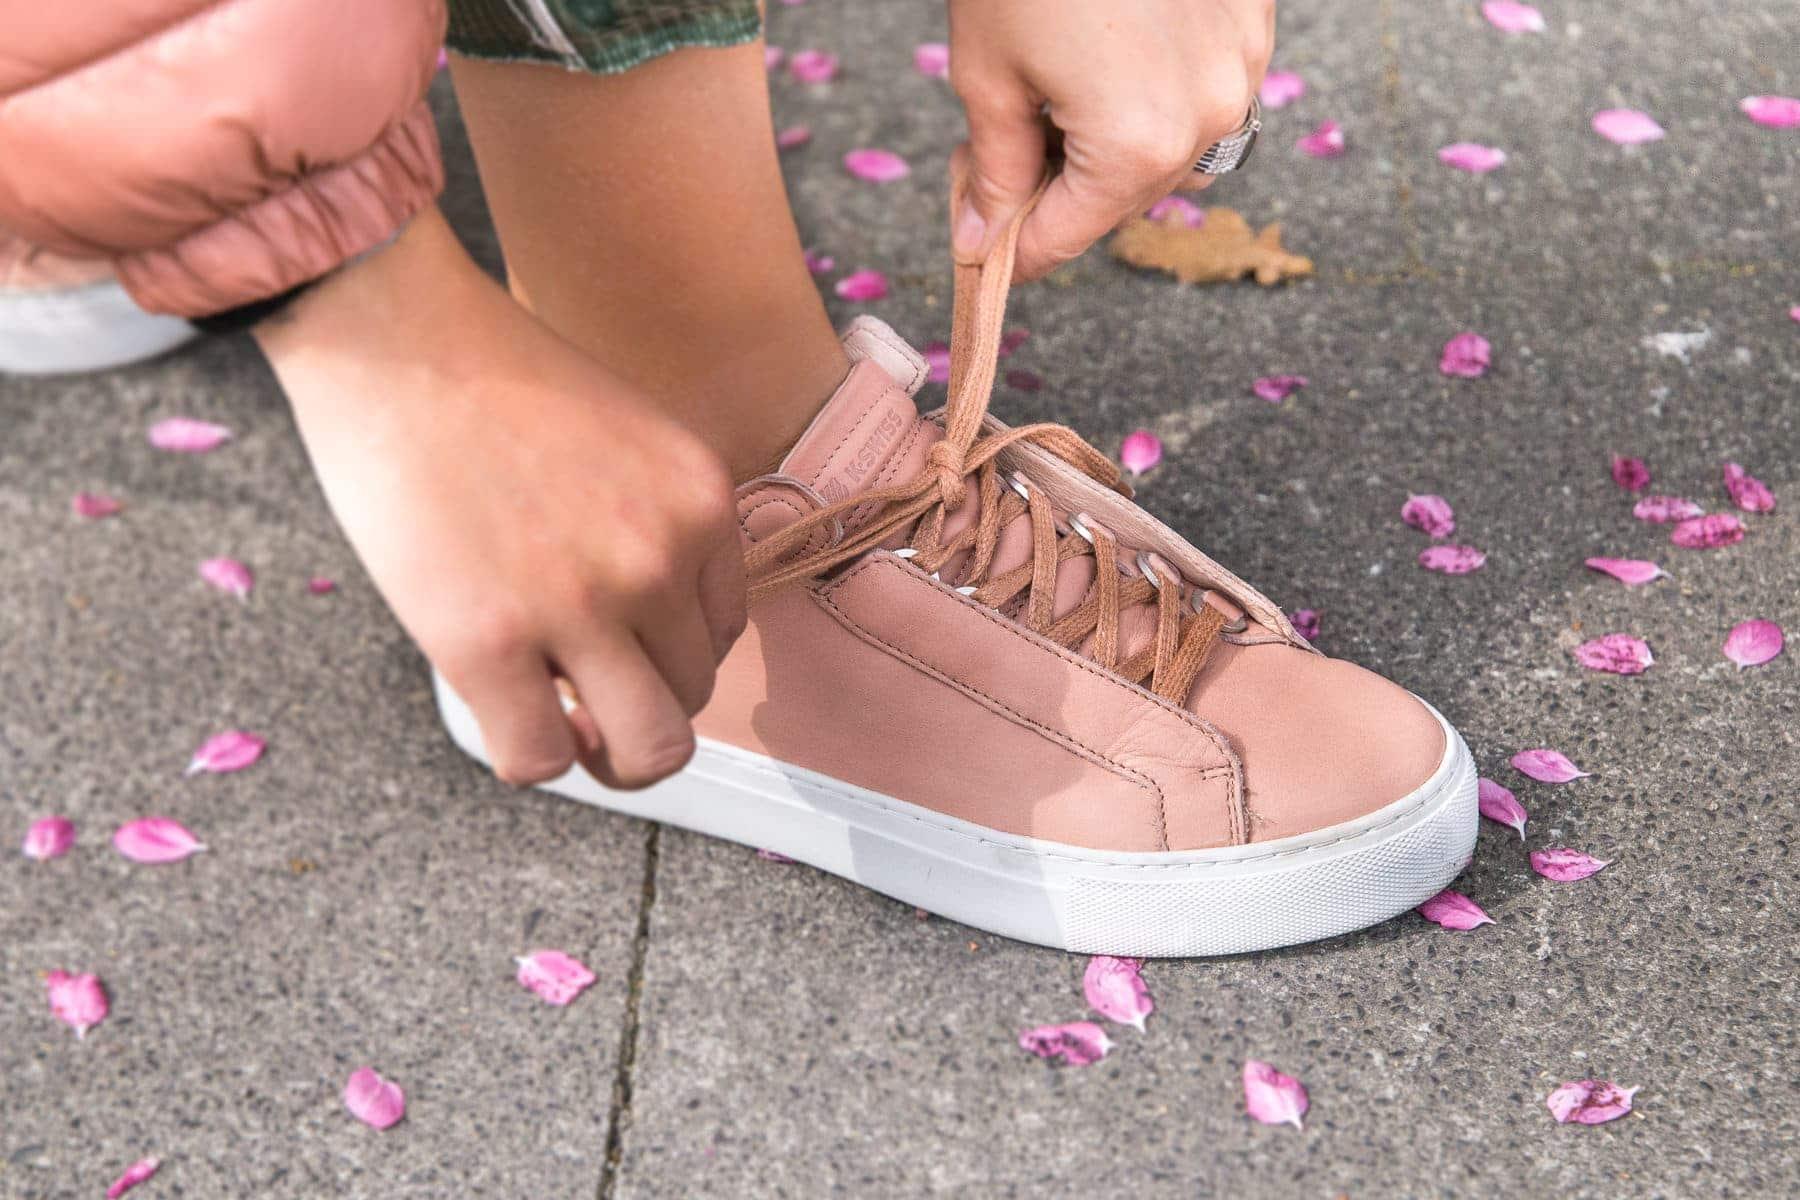 fruehling-in-koeln-kswiss-sneakers-daunenjacke-layering-look-fashion-blog-des-belles-choses-13